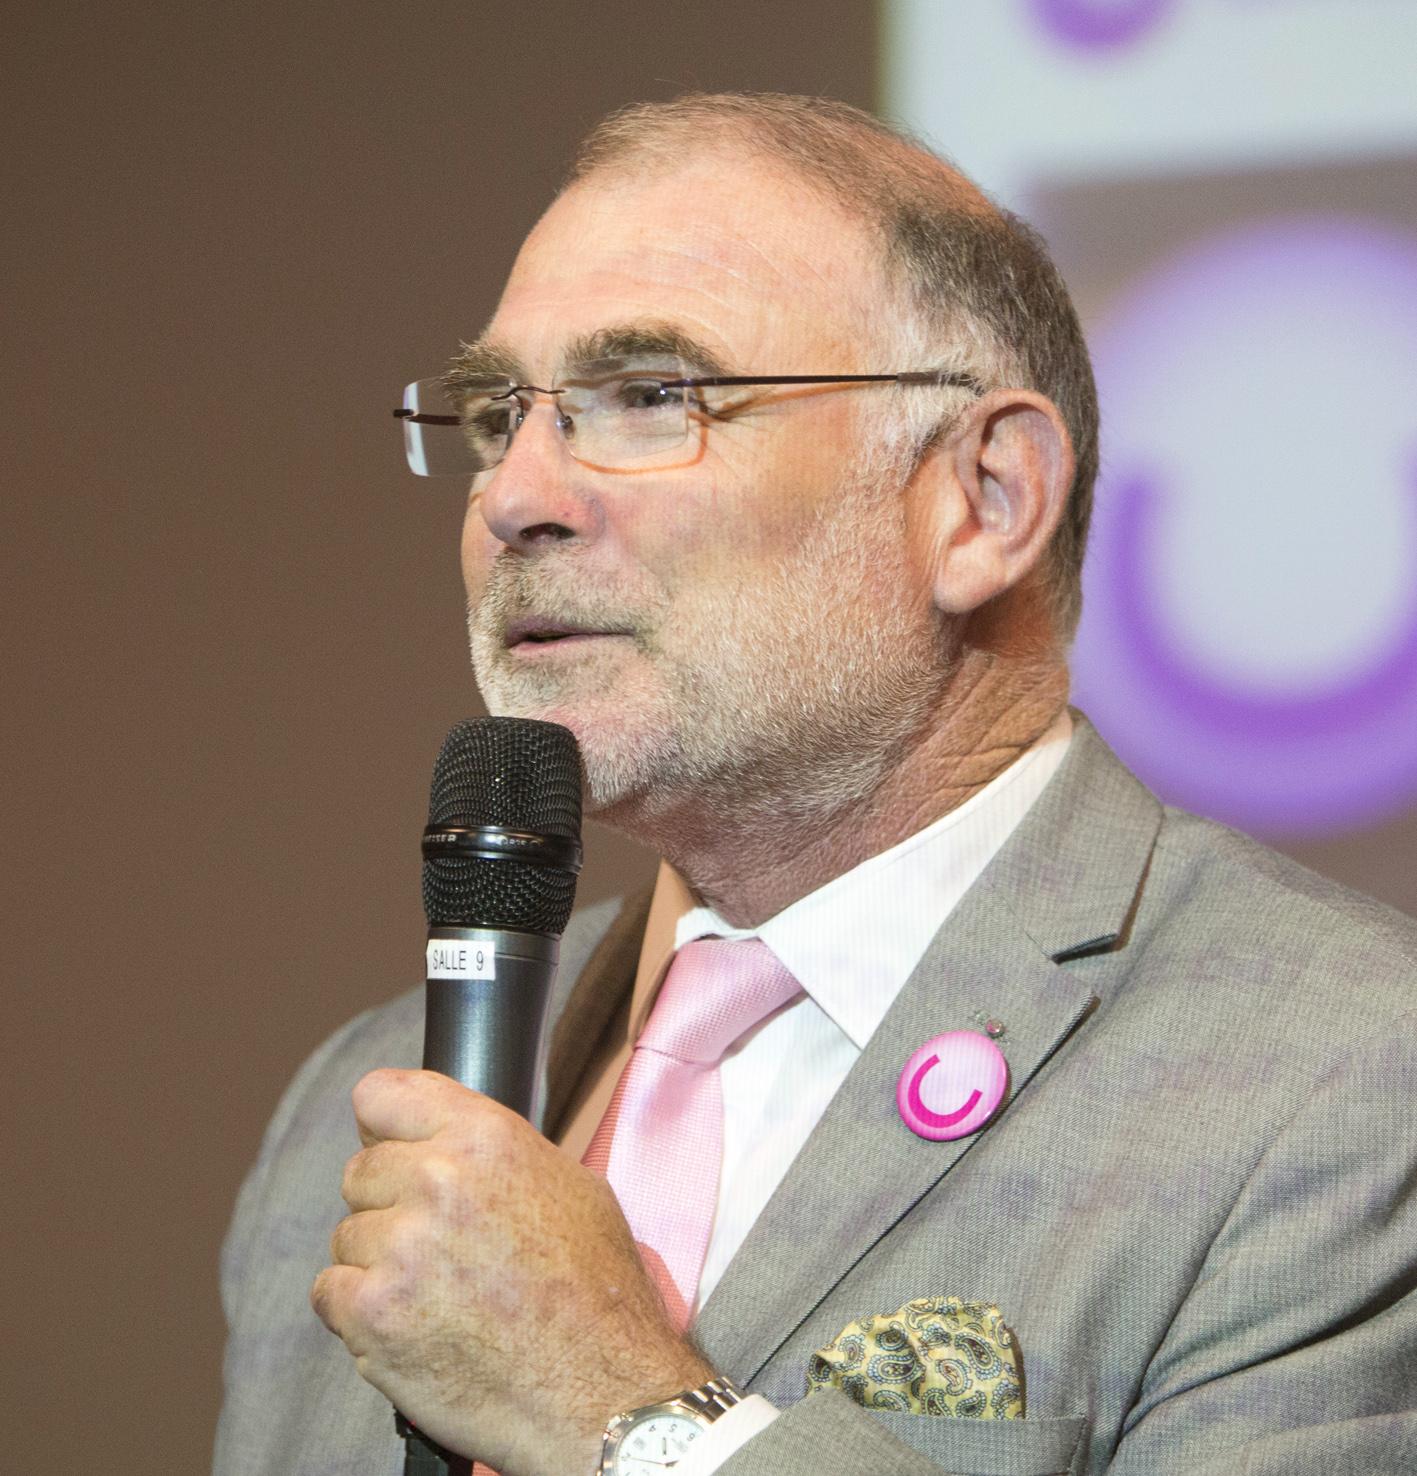 Yves de Montbron conférencier optimisme